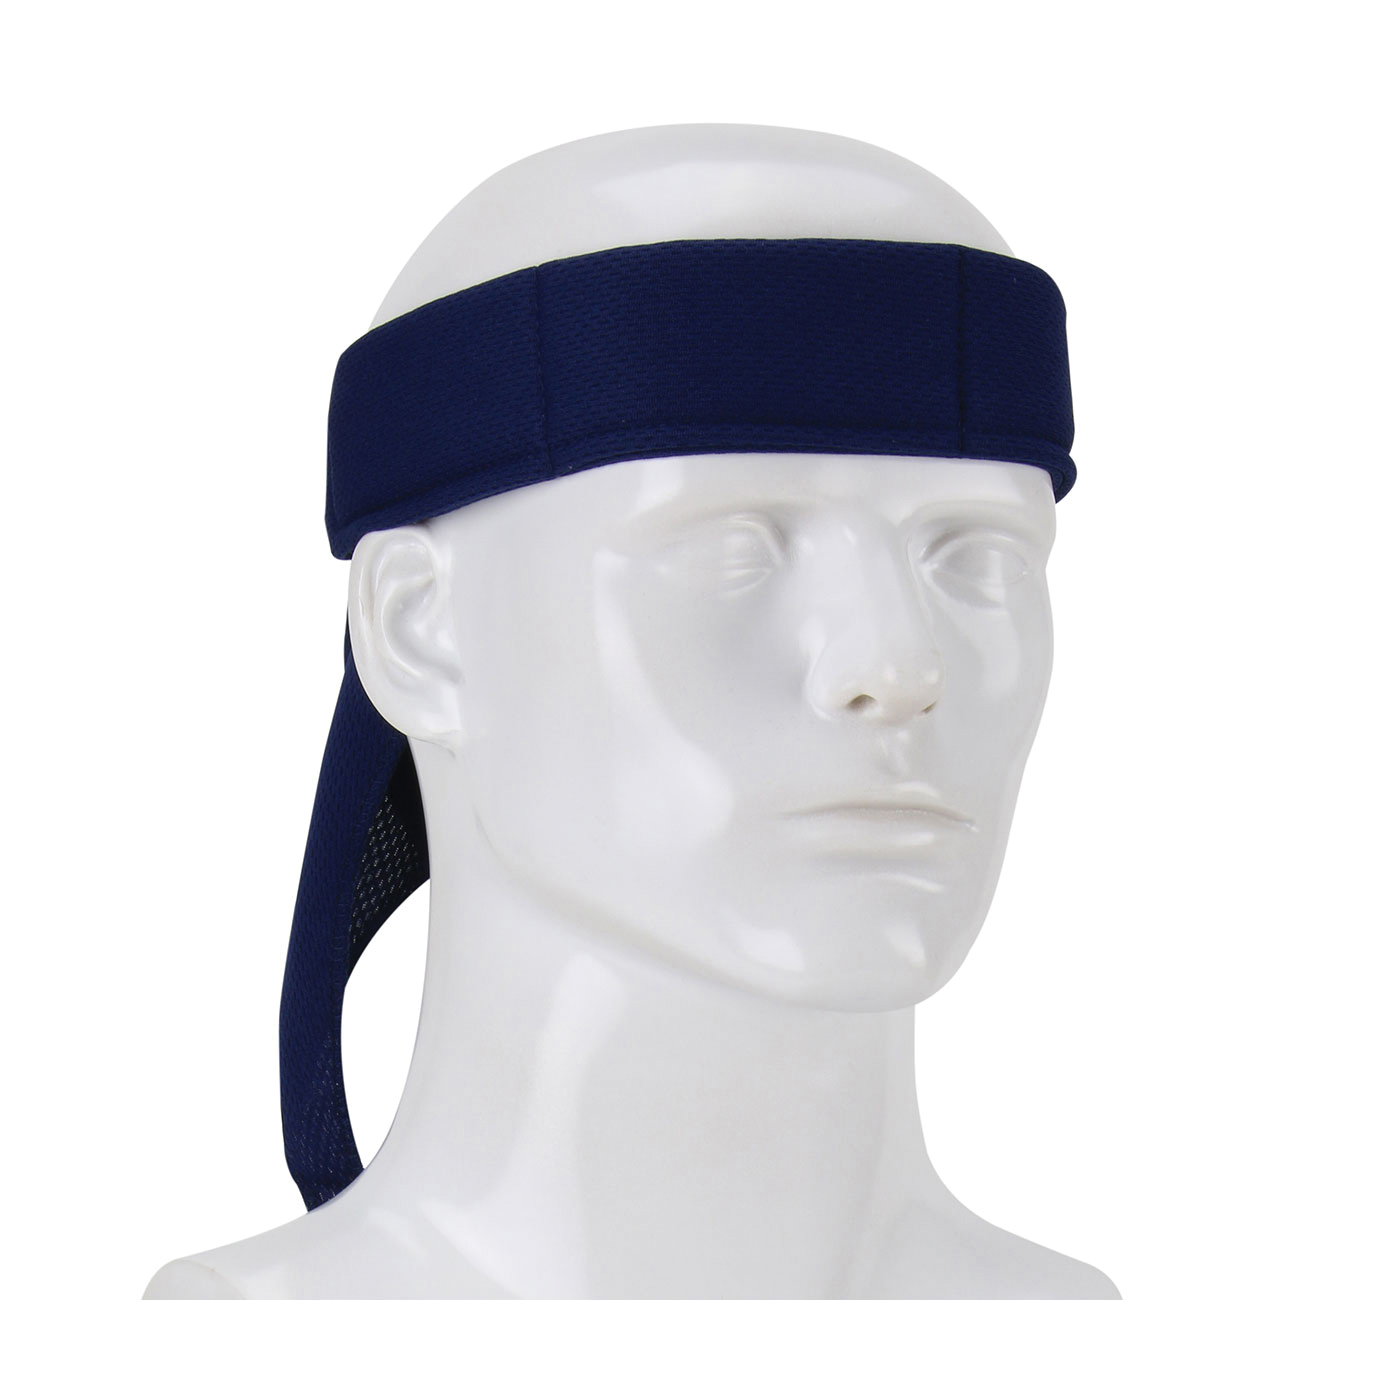 PIP® EZ-Cool® 393-EZ201-NVY Flash Evaporative Cooling Bandana, Universal, Navy, 65% Polyester/35% Cotton Poplin, Breakaway Snap Closure